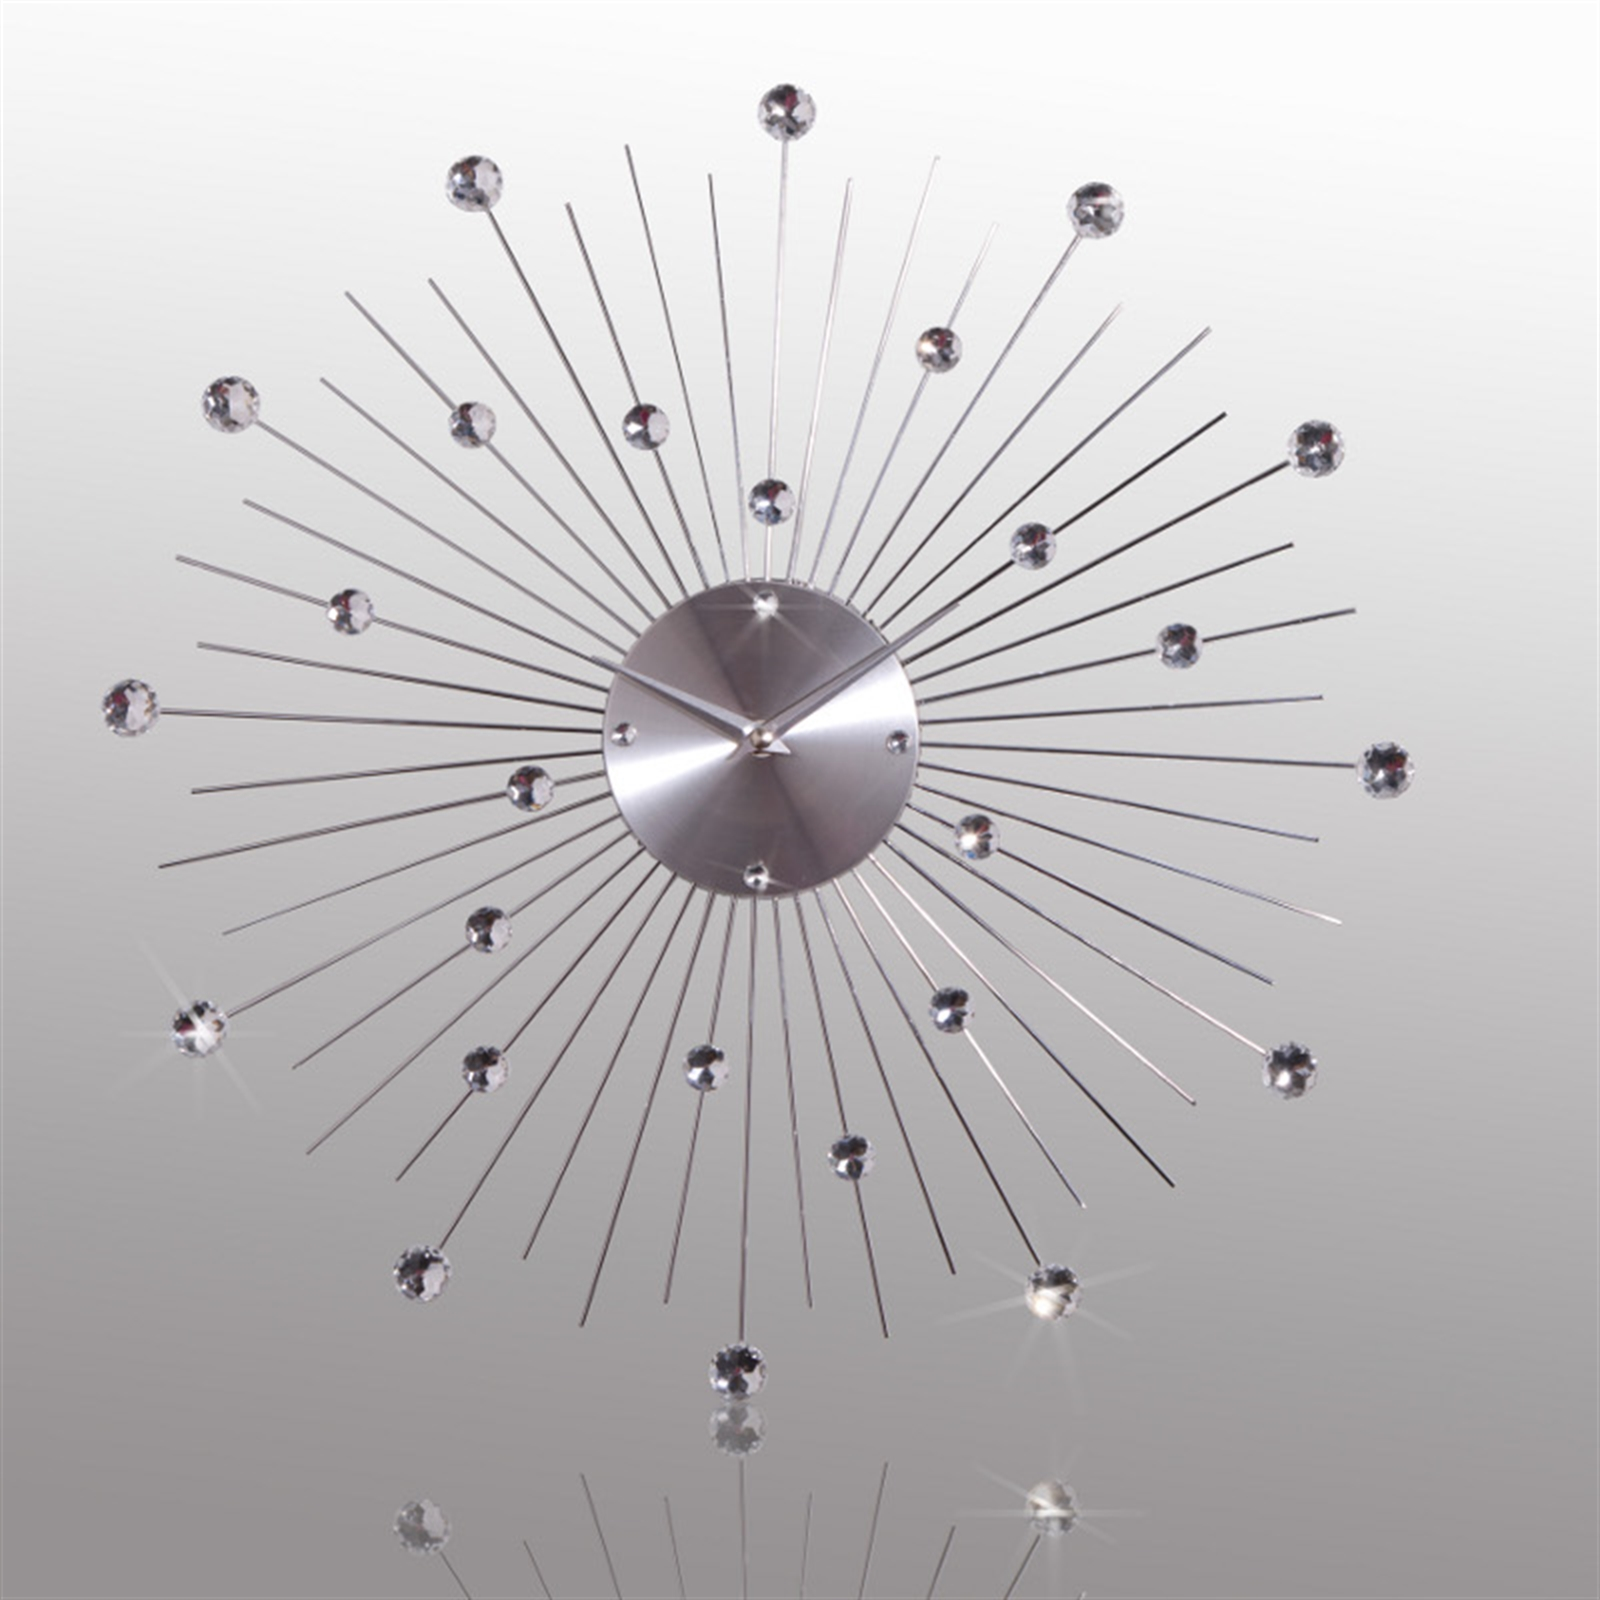 Design wall clock sunburst crystal 50 cm silver watch image is loading design wall clock sunburst crystal 50 cm silver amipublicfo Choice Image